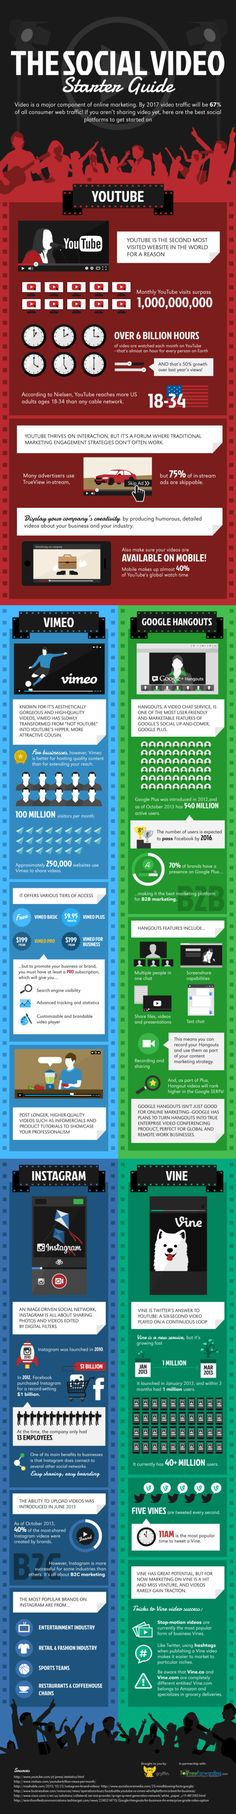 The Social Video guide #infografia #infographic #socialmedia